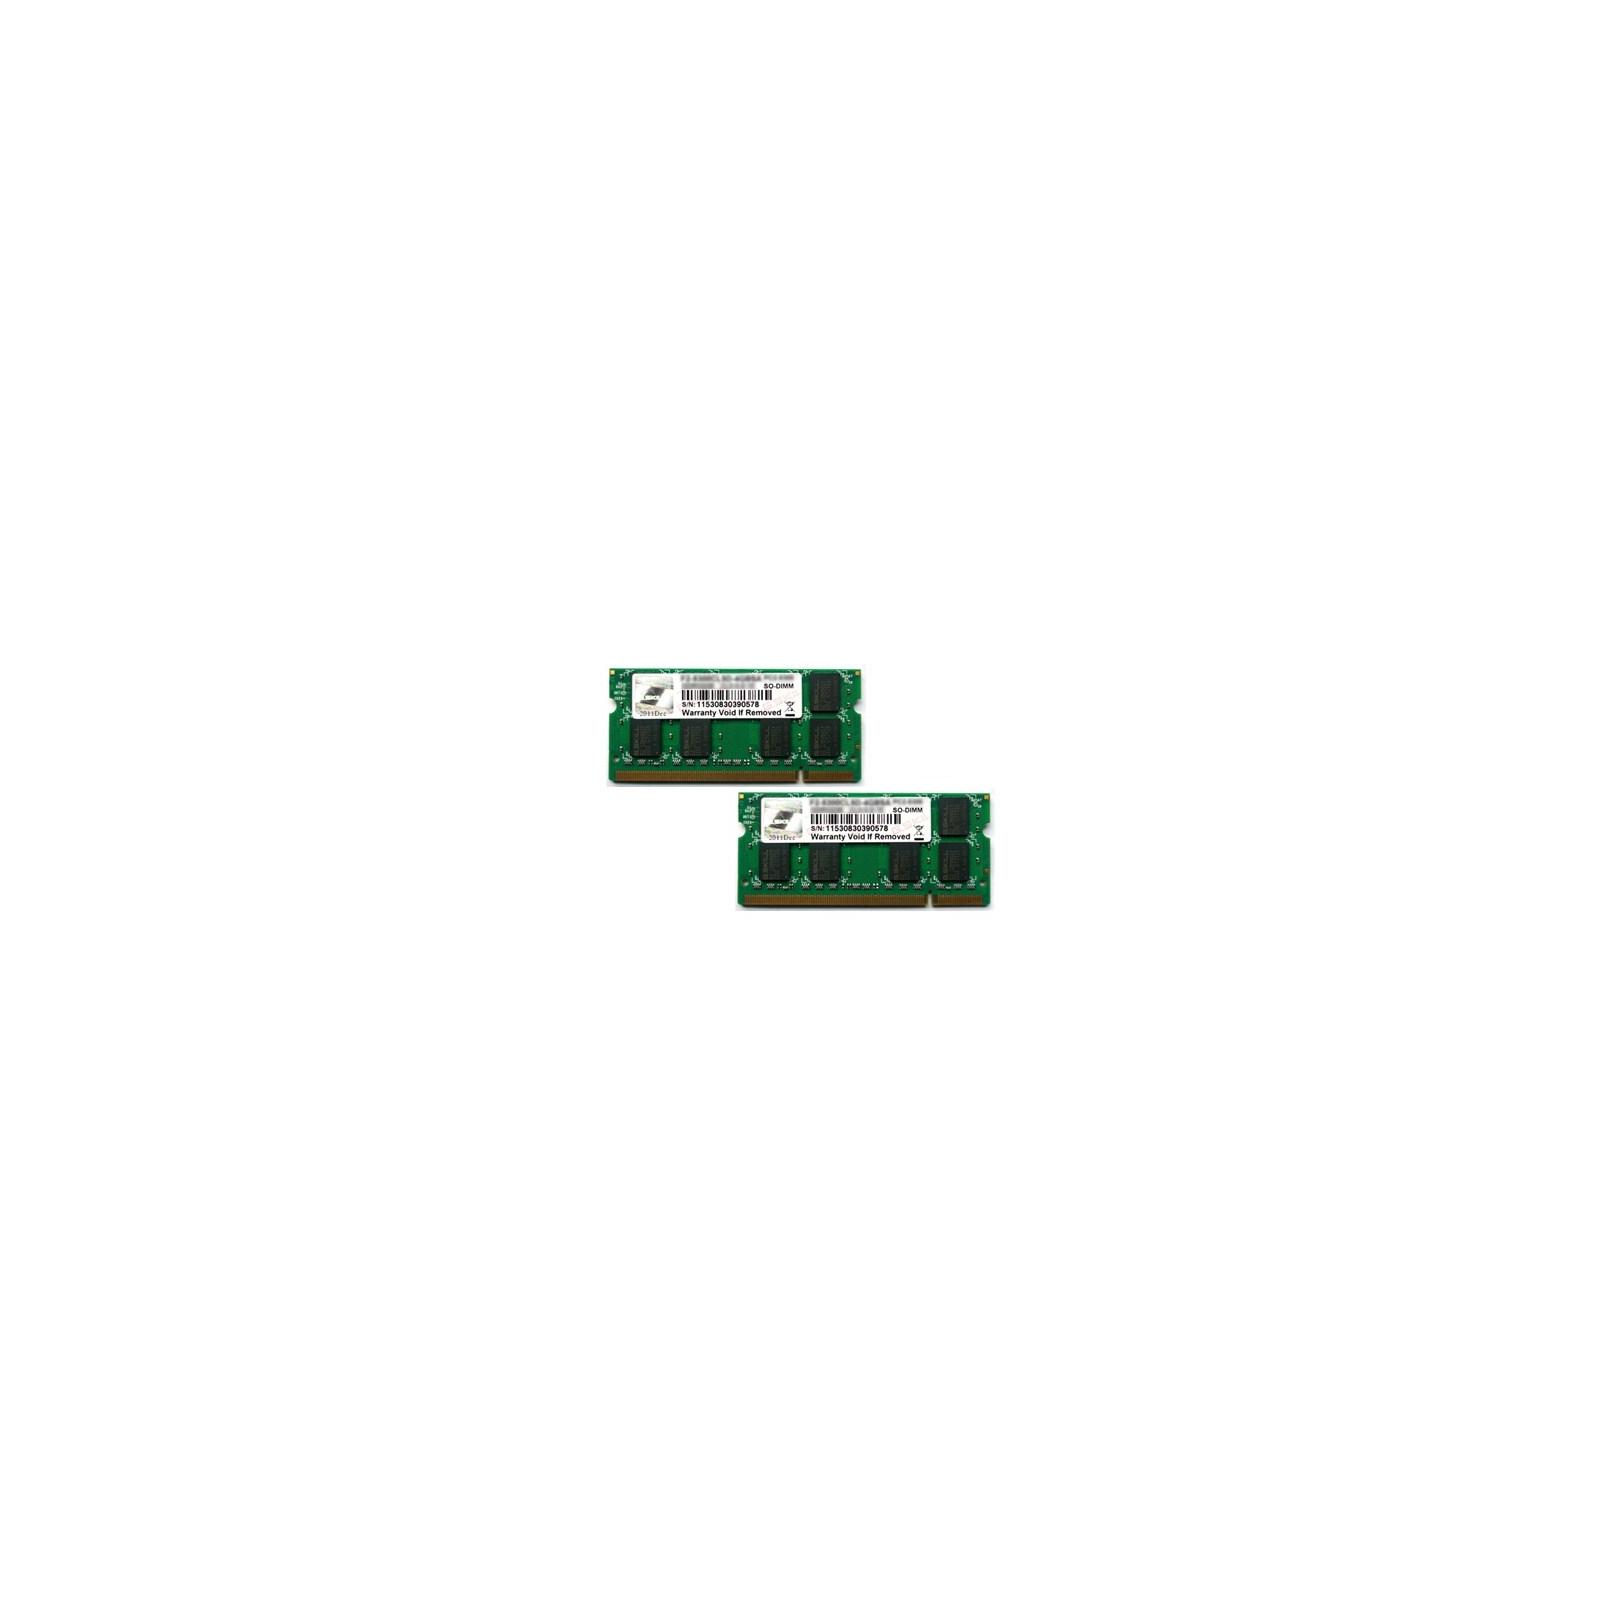 Модуль памяти для ноутбука SoDIMM DDR2 2GB(2x1GB) 800 MHz G.Skill (F2-6400CL5D-2GBSA)